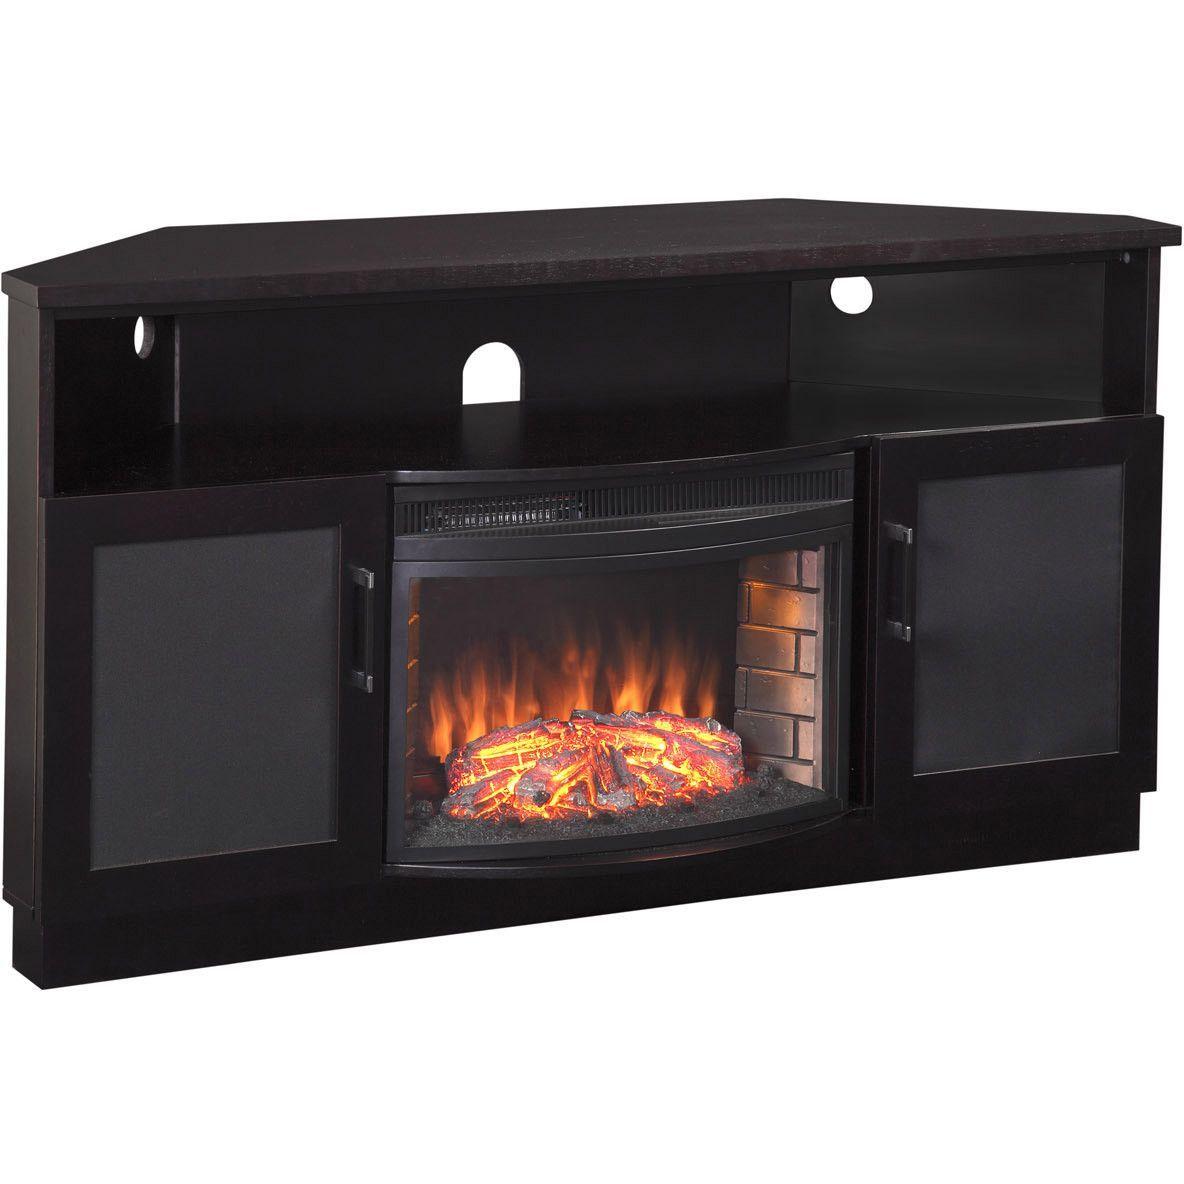 Furnitech Corner Tv Stand Electric Fireplace For 65 Tv Ft60cccfb Fireplace Tv Stand Electric Fireplace Tv Stand Tv Stand Black electric fireplace tv stand